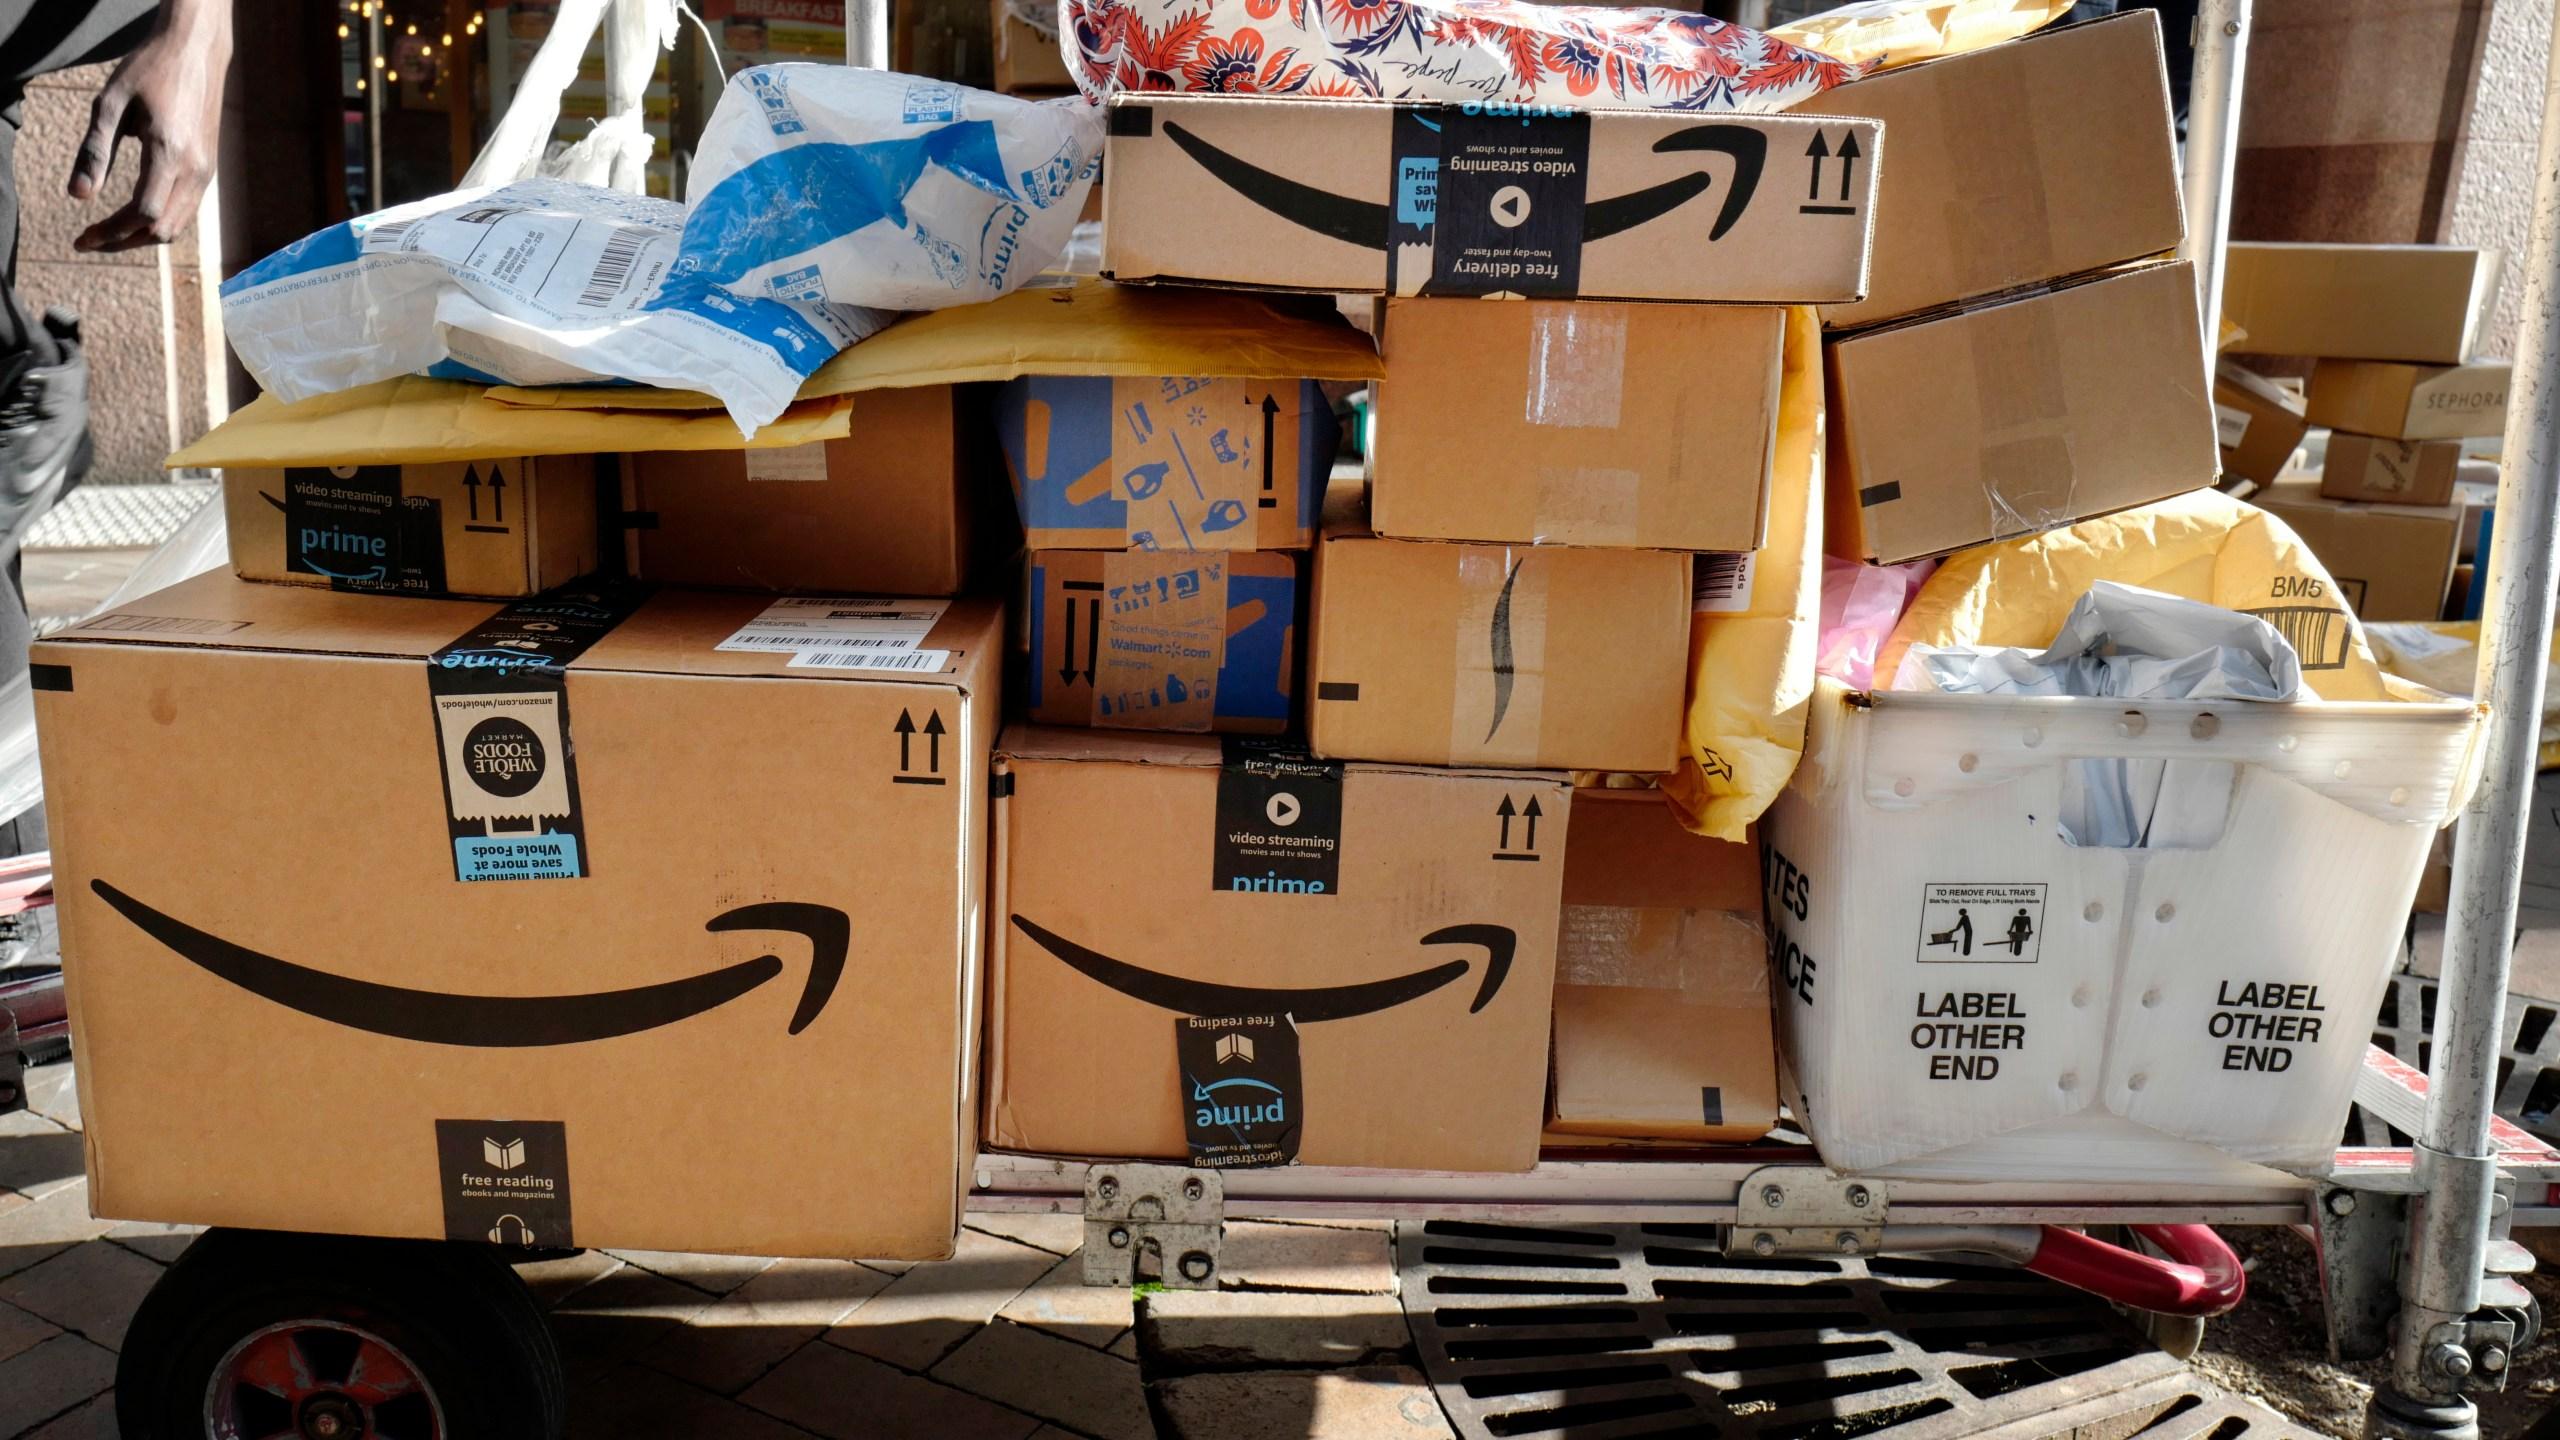 Amazon_Delivery_Employees_75396-159532.jpg05189553